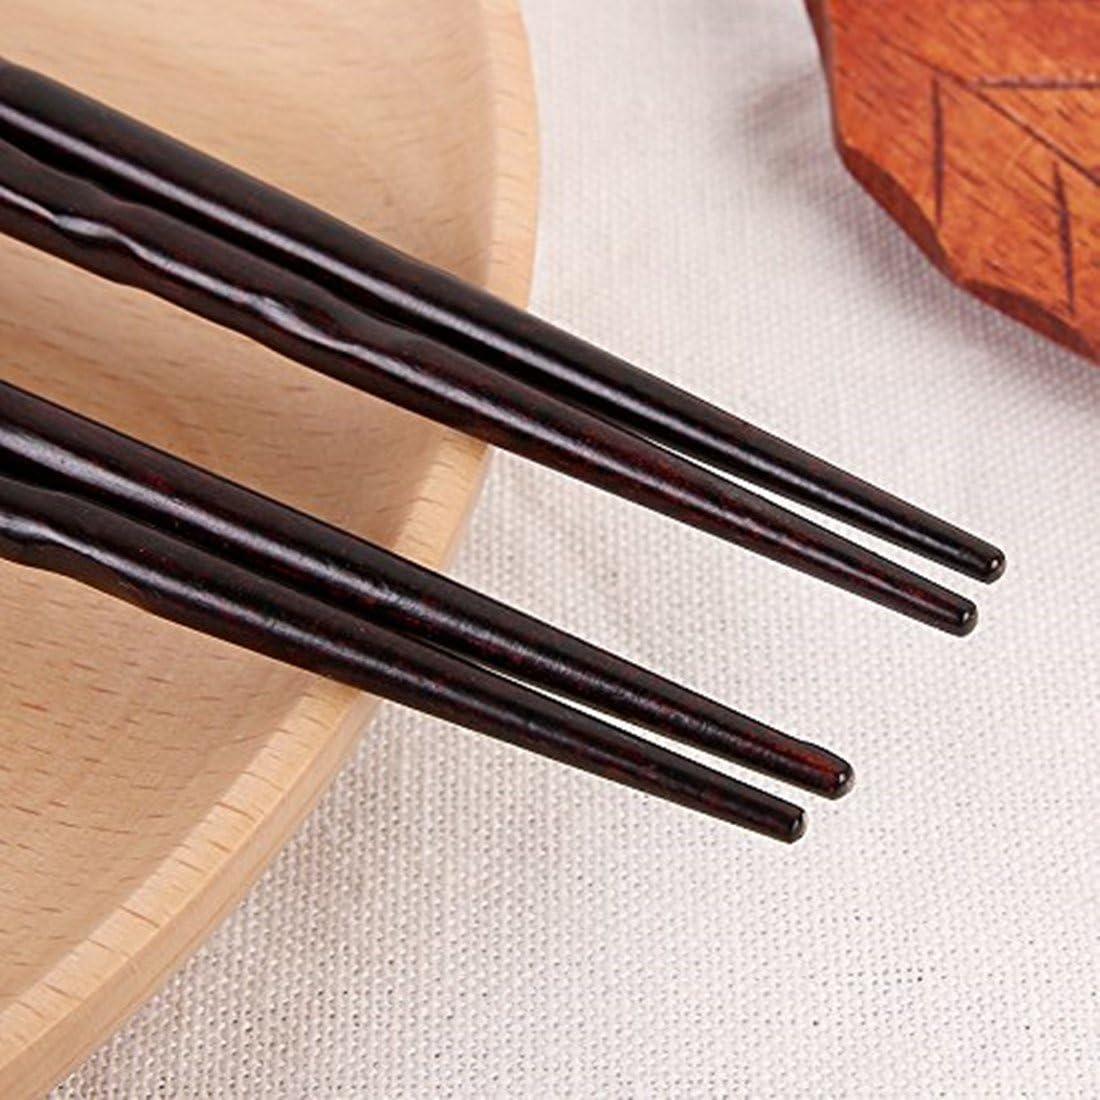 Fecihor 5 par Palillos de Madera Natural Restaurante Chino Japon/és Palillos Set Antideslizante Palillos Regalo